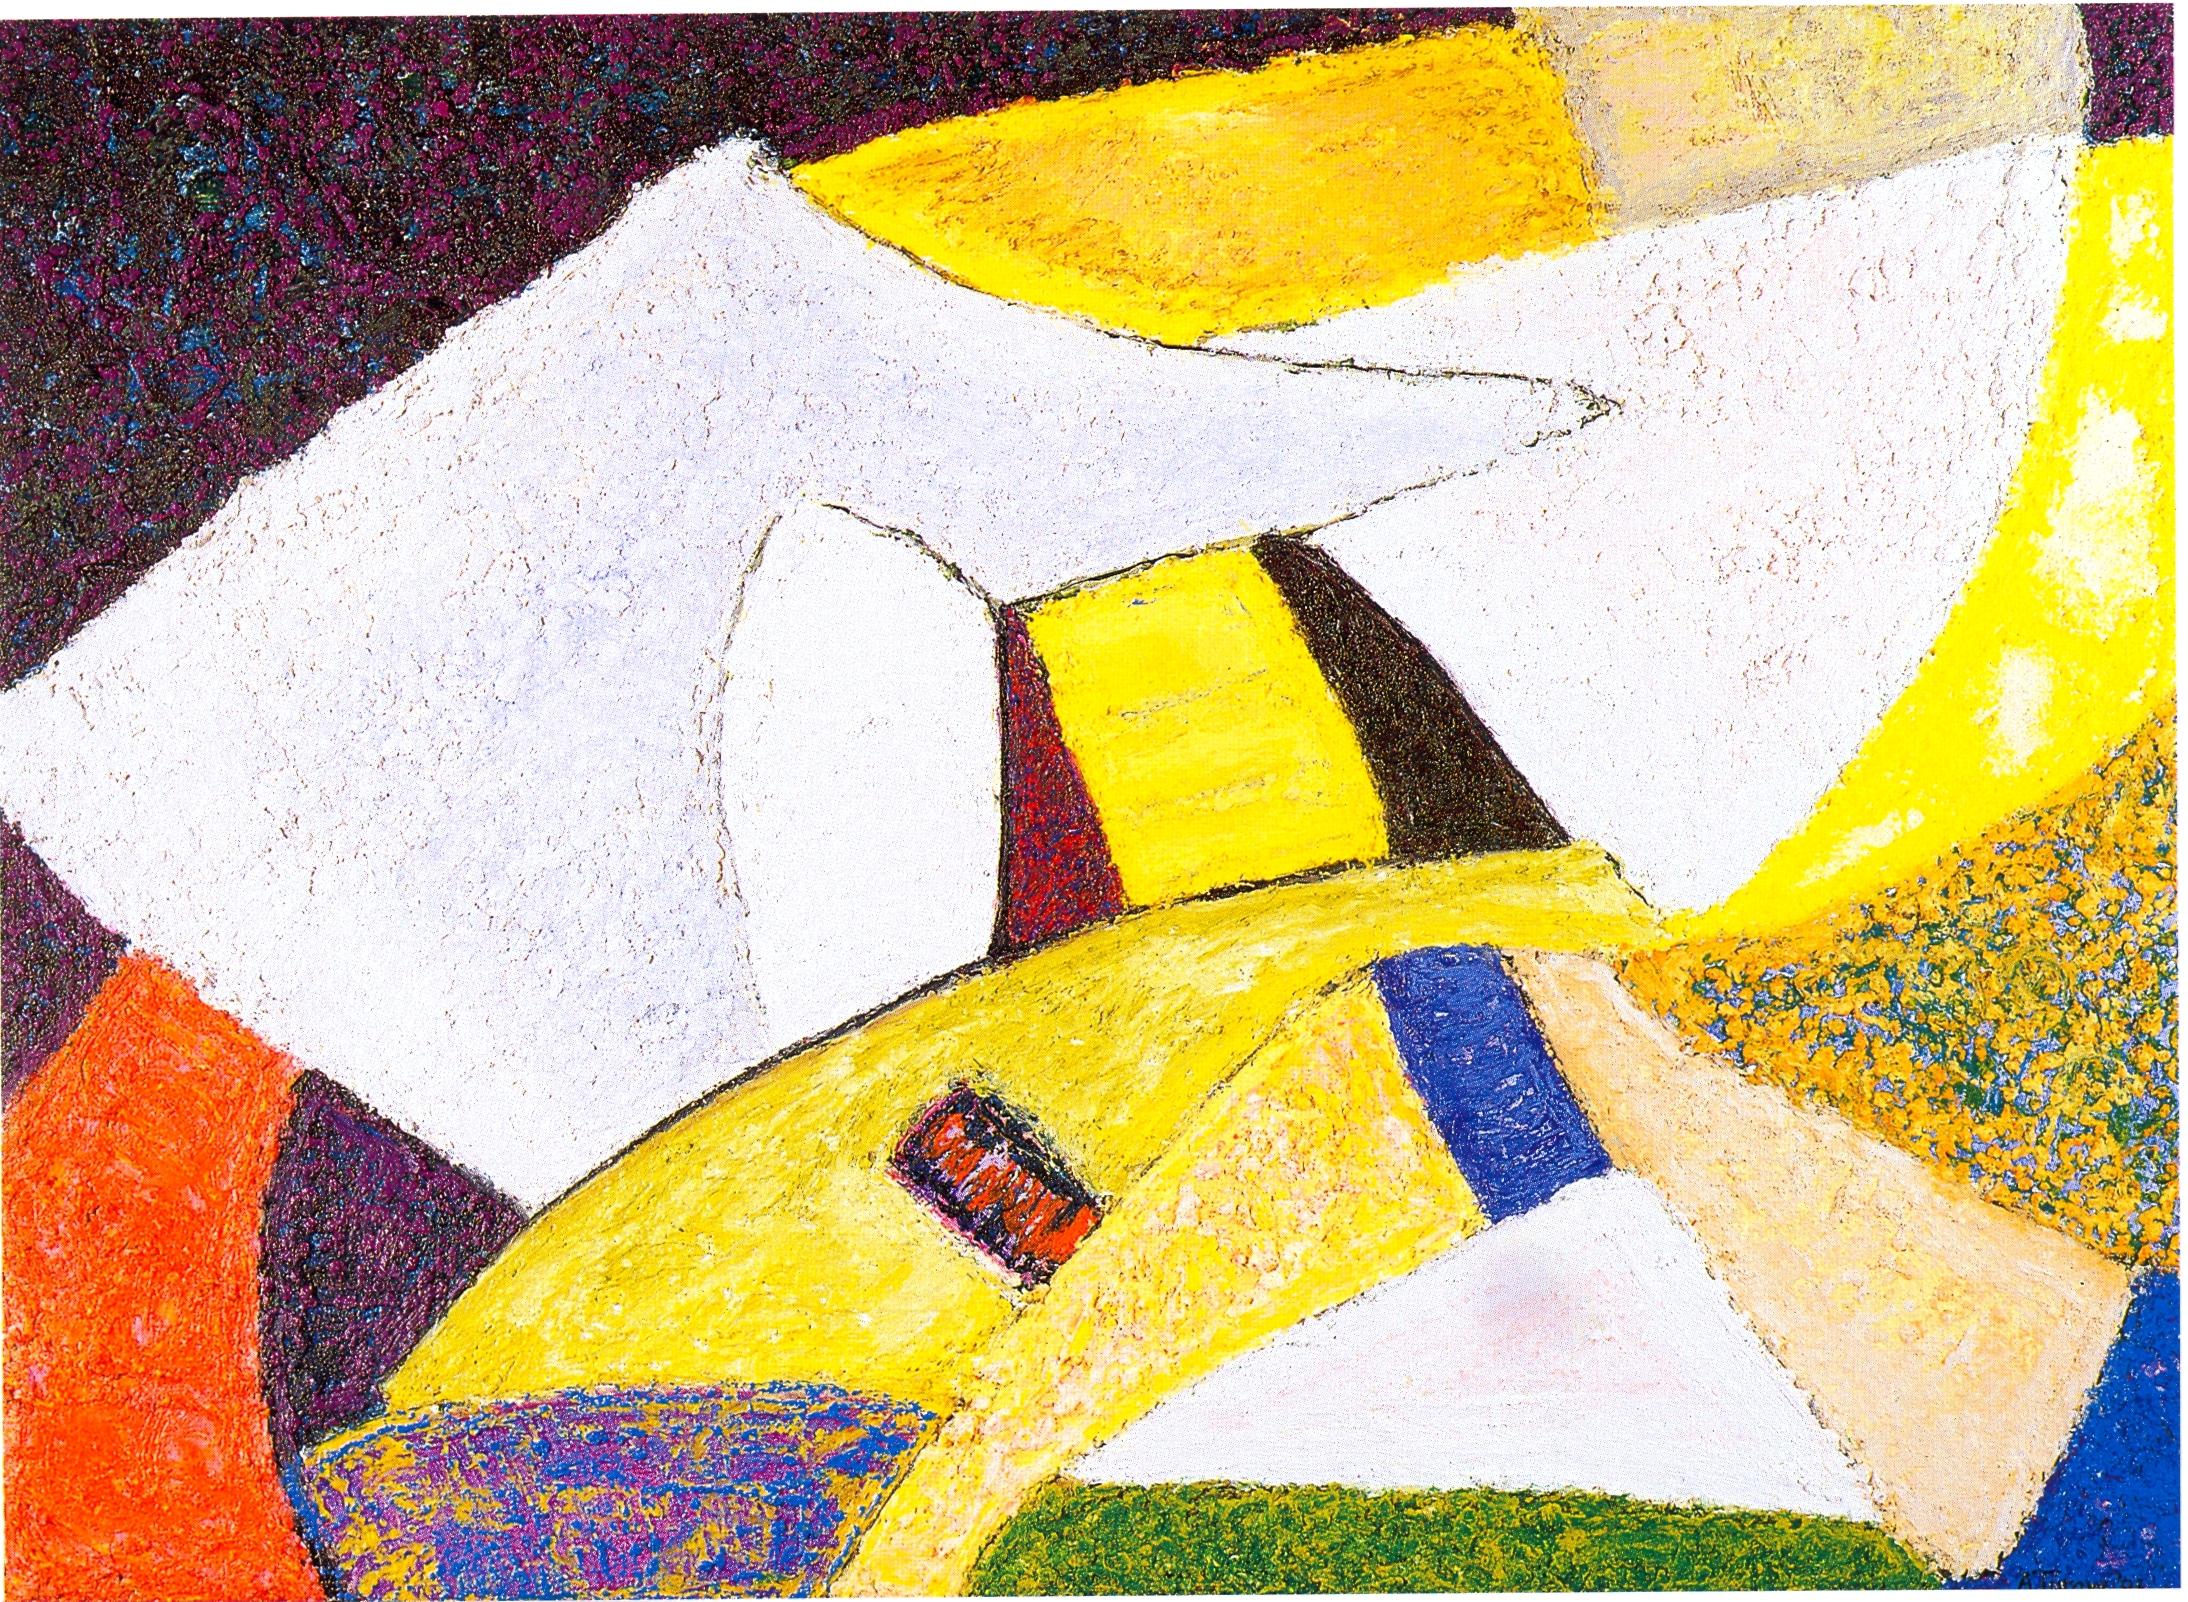 "Annette Turow,   Moonlit,   2002, Acrylic, Gels, Oil Stick on canvas, 22"" x 30"""